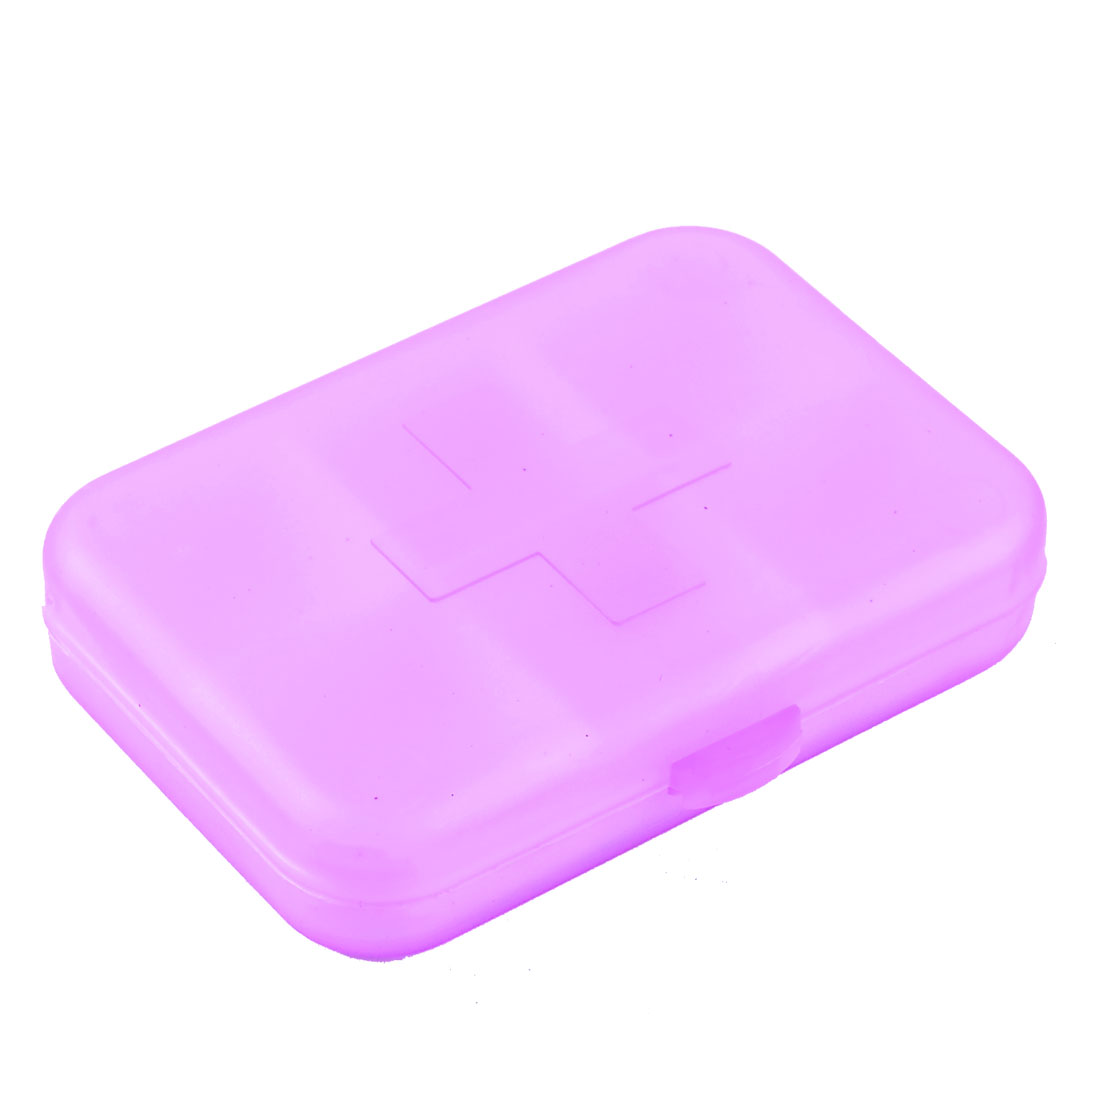 Travel Medicine Pill Collection Plastic Storage Case Box Holder Purple